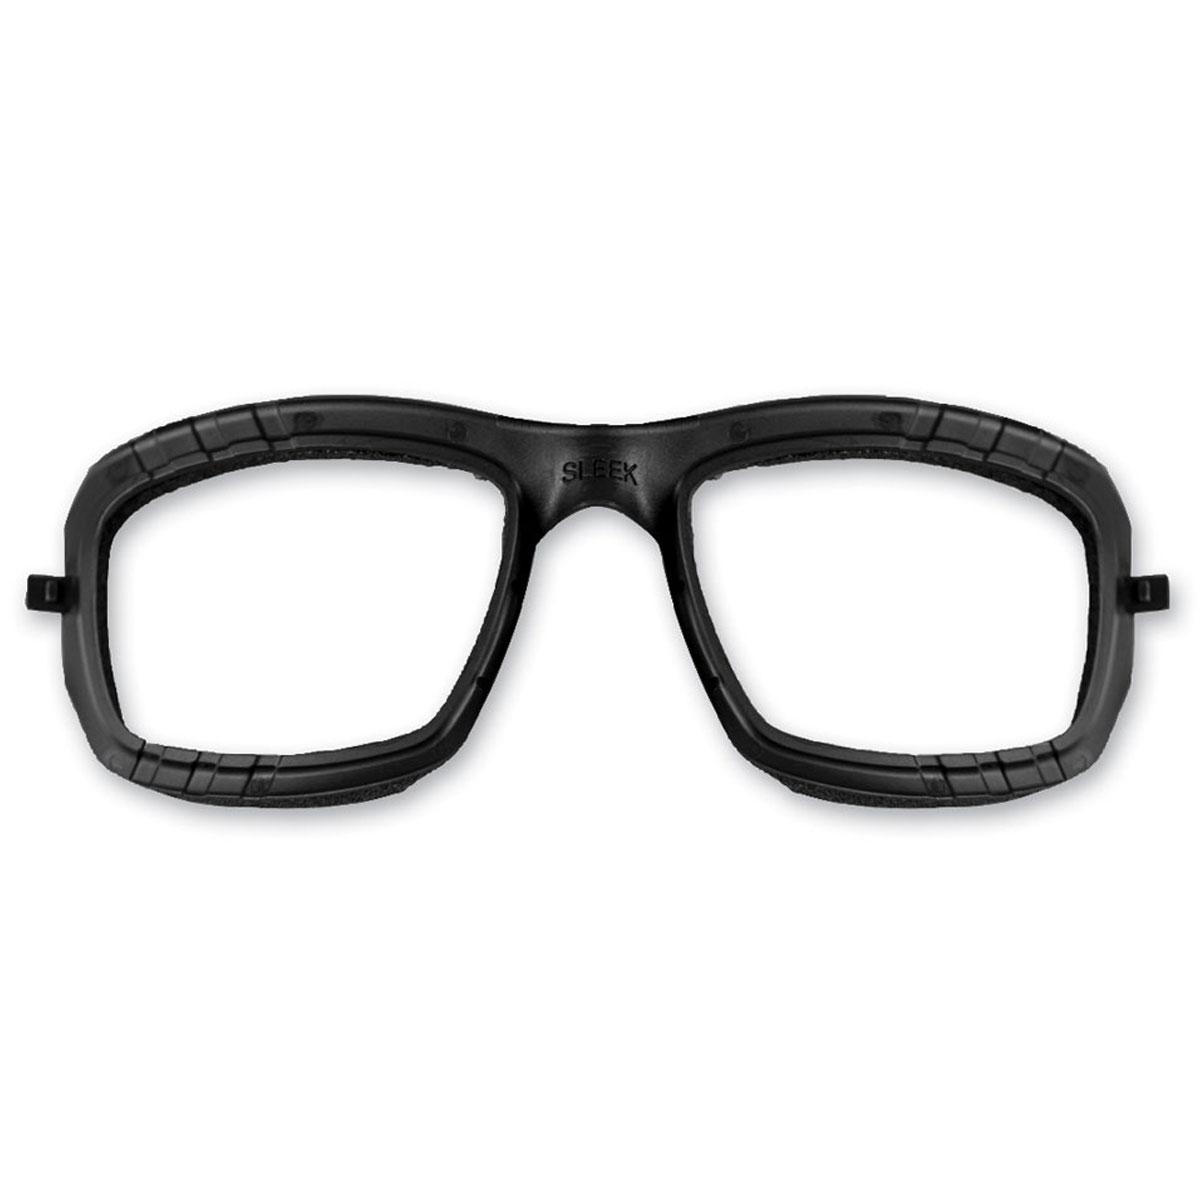 944374fb33 Wiley X Sleek Removable Facial Cavity Seal - CCSLEG